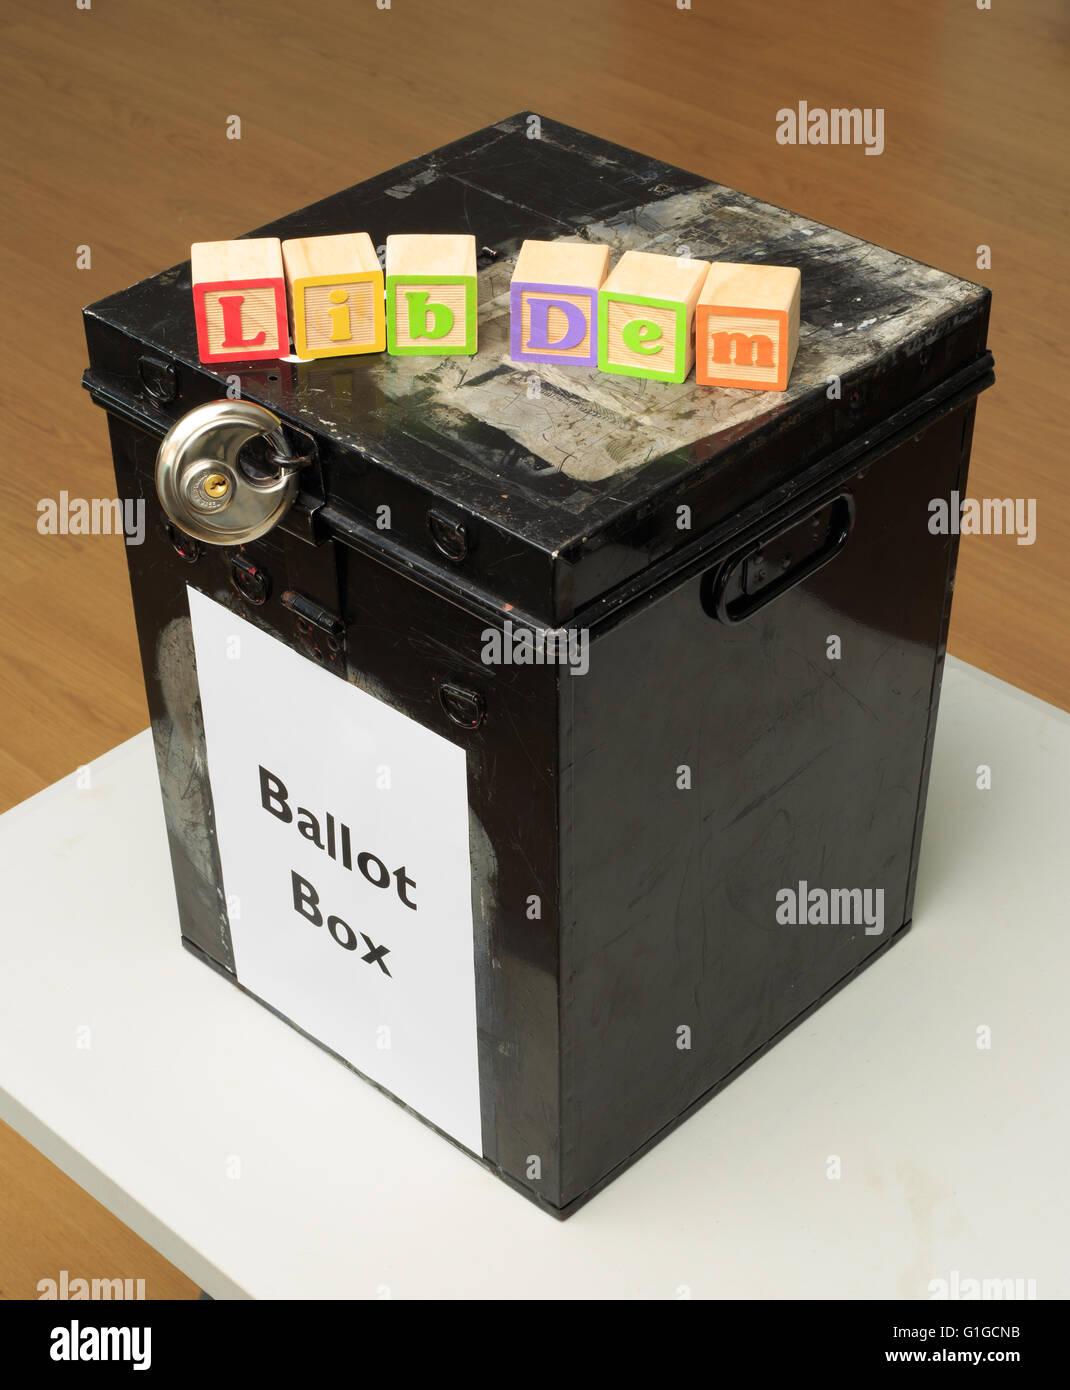 UK ballot box and childs' ABC blocks stating 'Lib Dem' in reference to British politics. - Stock Image